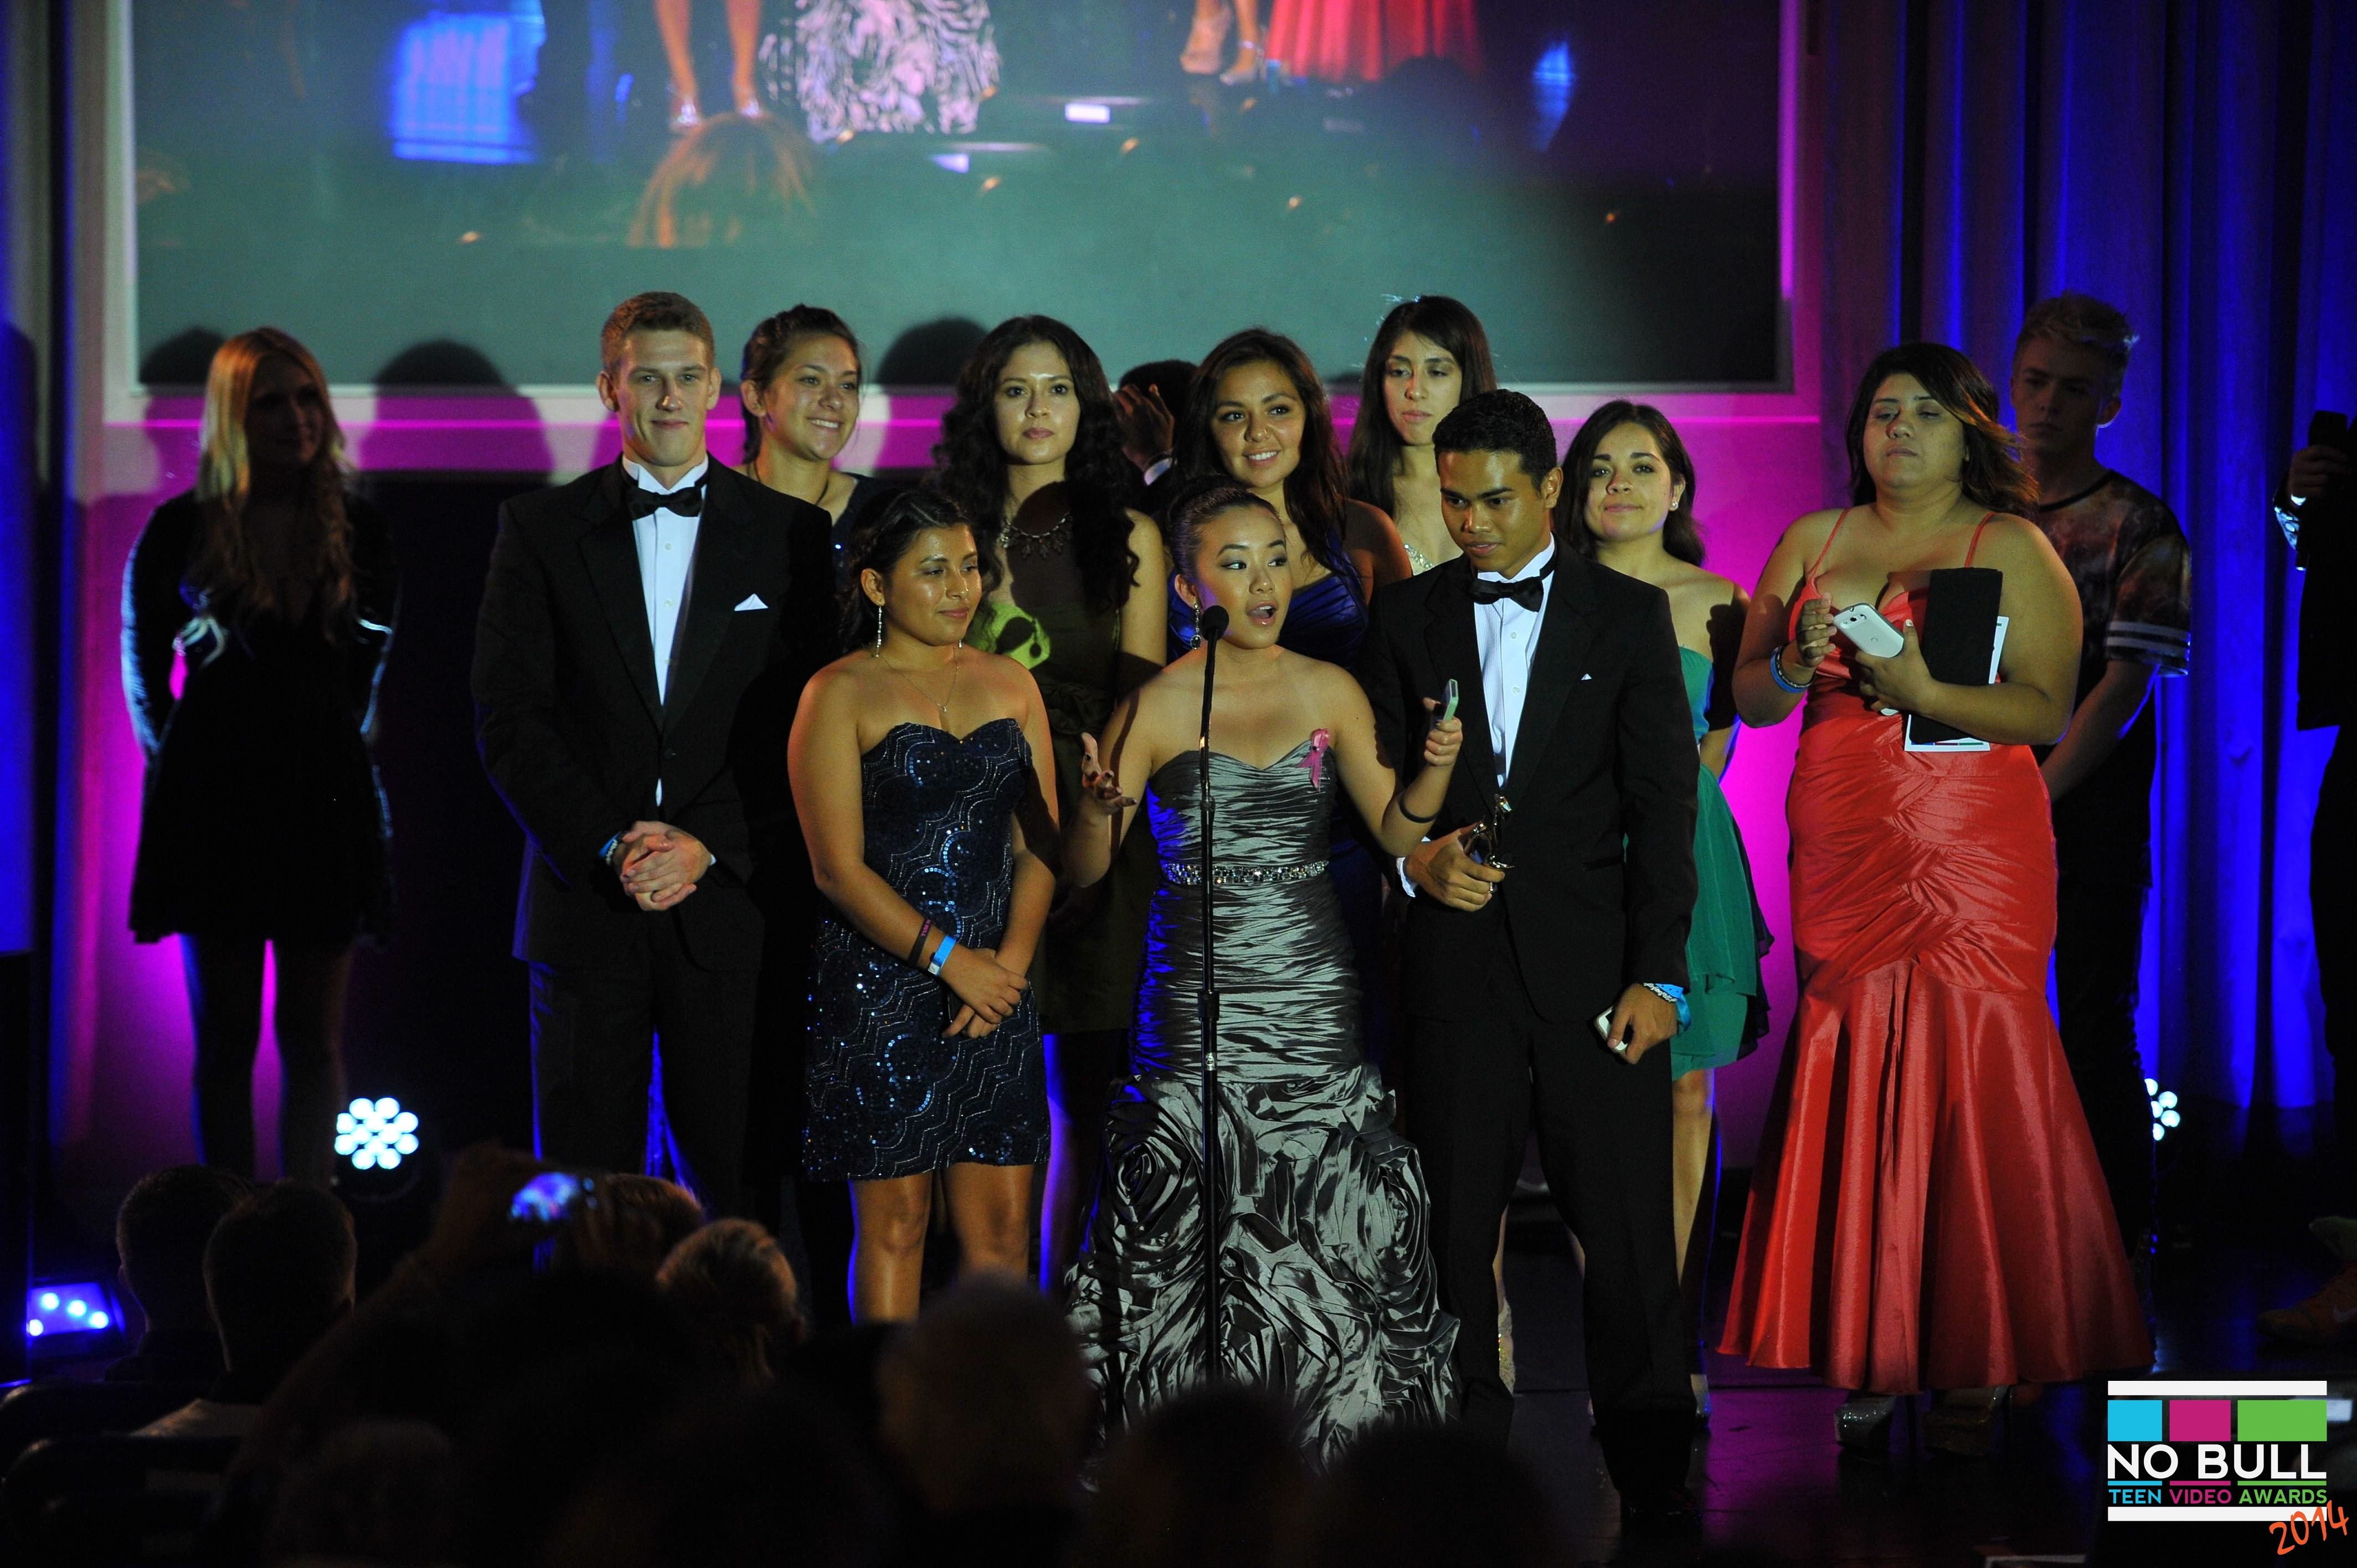 Christi & FUSD - 2014 Award Winners